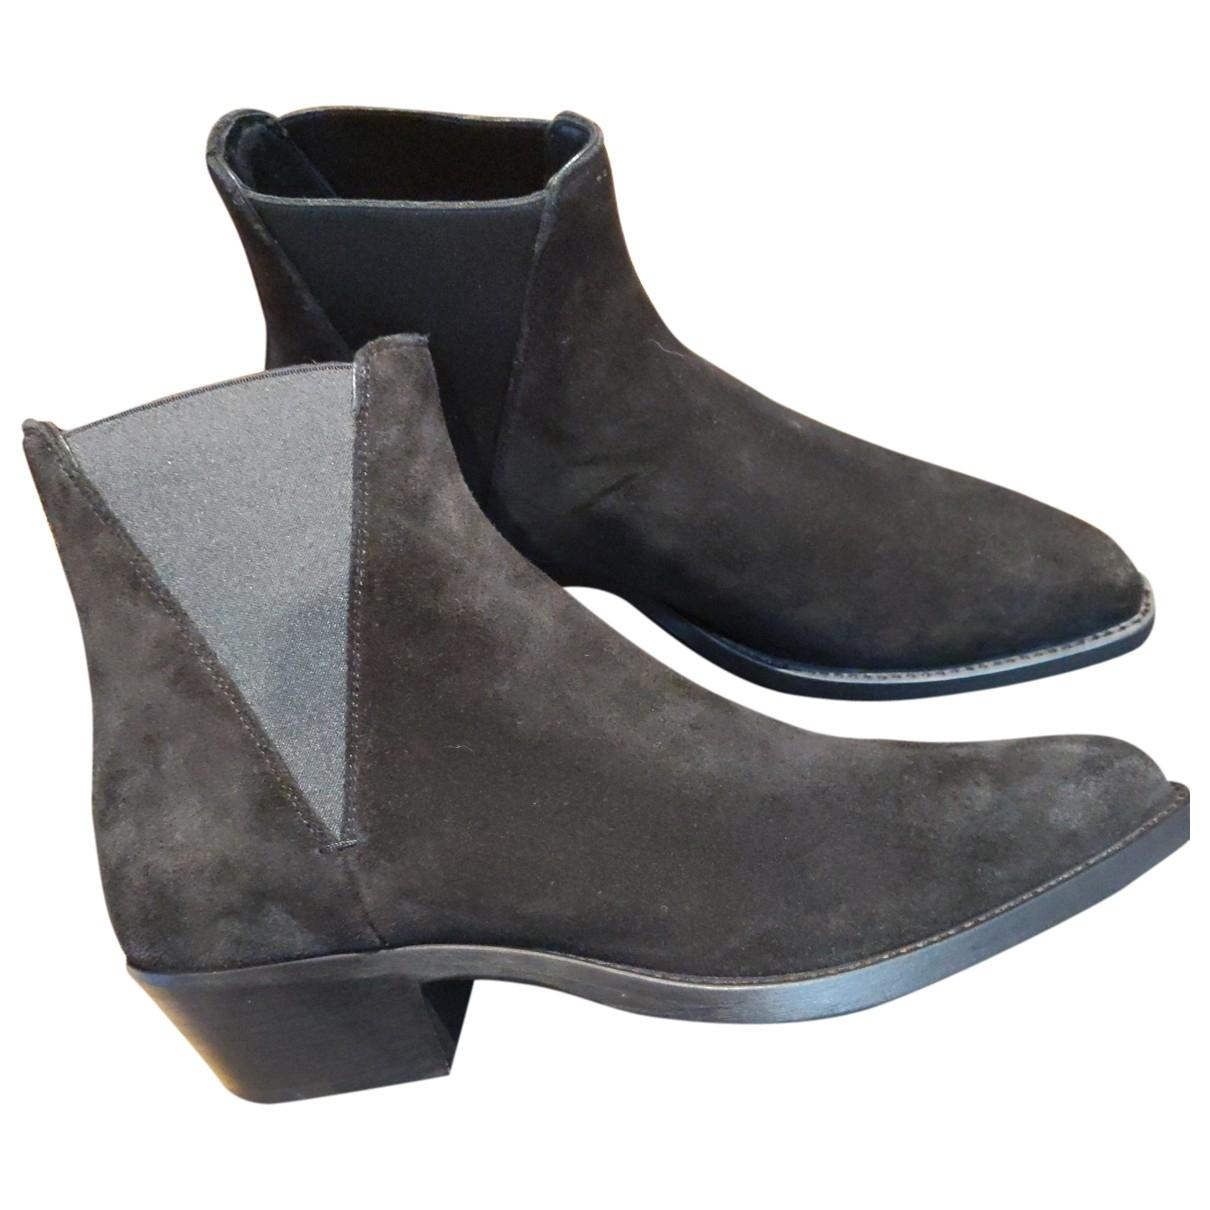 Saint Laurent Dakota Black Suede Boots for Men 40.5 EU